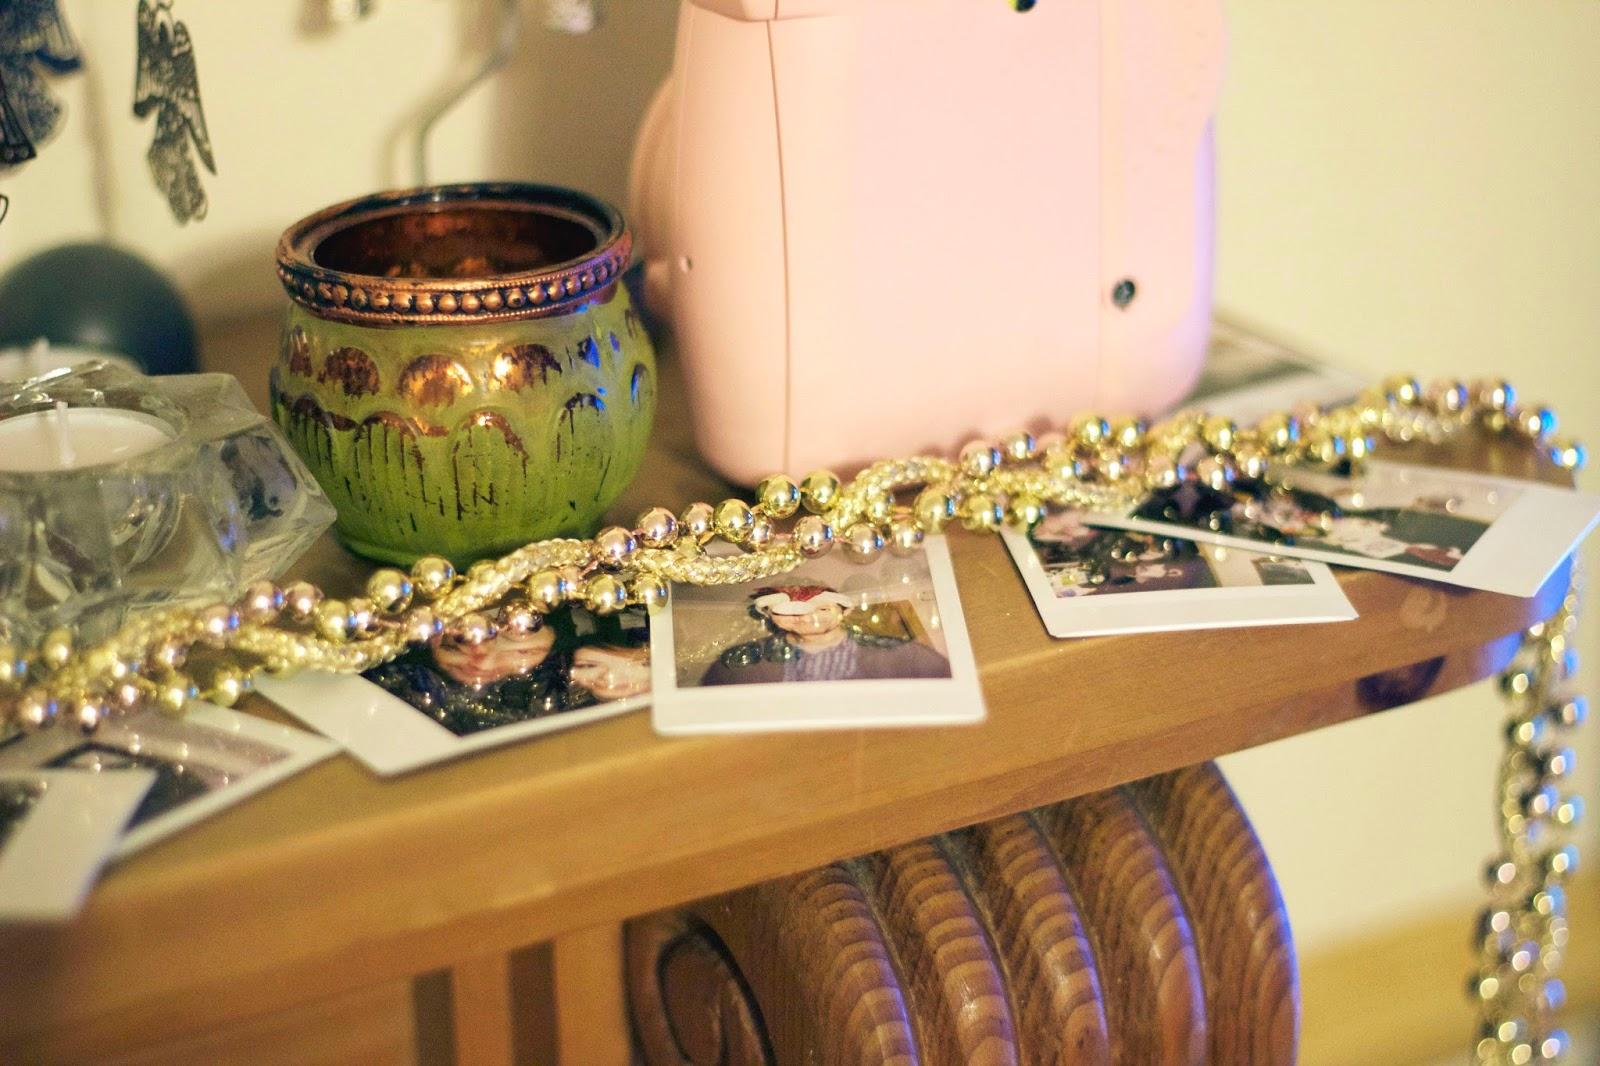 Polaroids, Instax Shots,